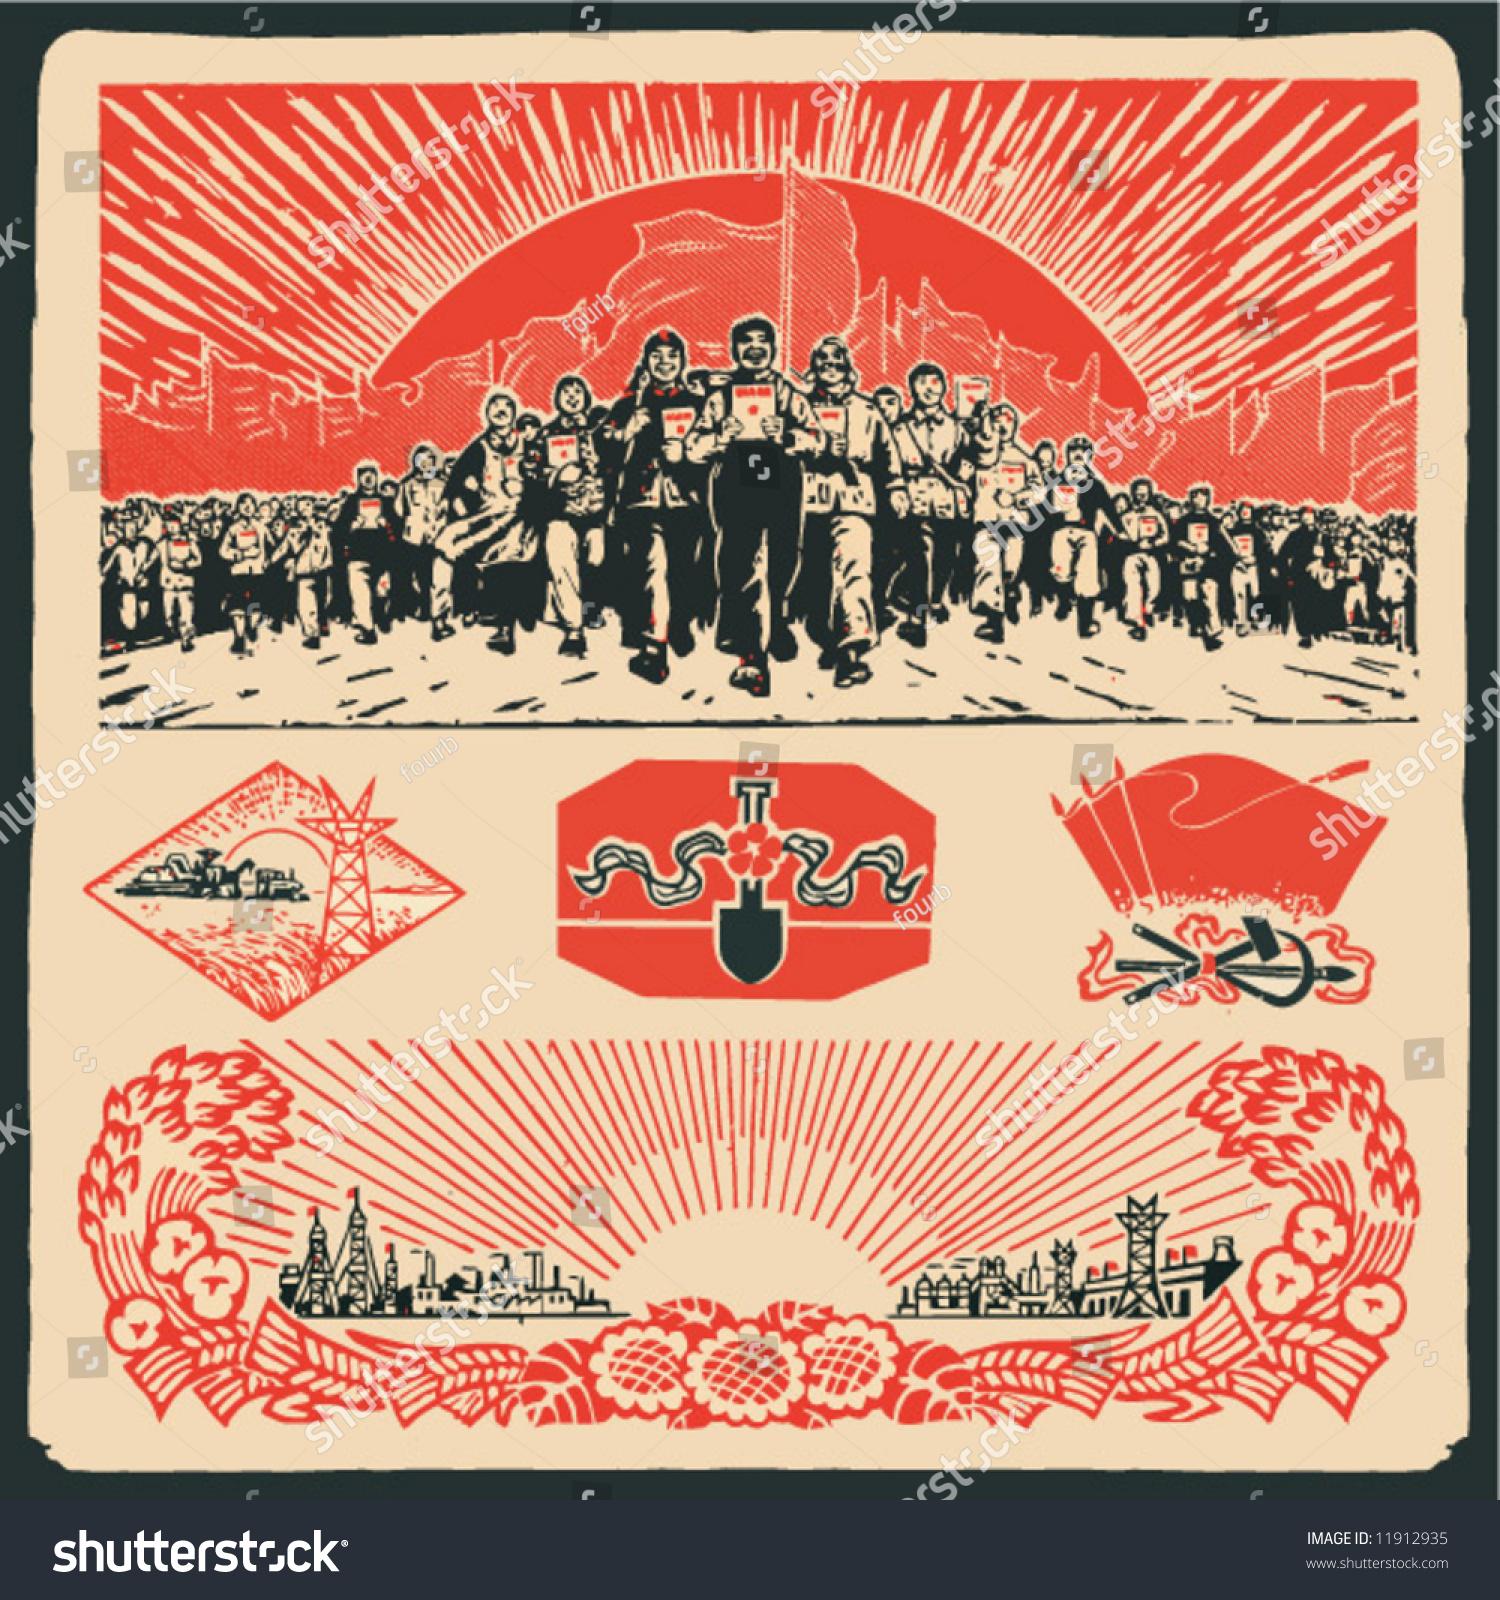 Old Communism Poster Stock Vector 11912935 - Shutterstock